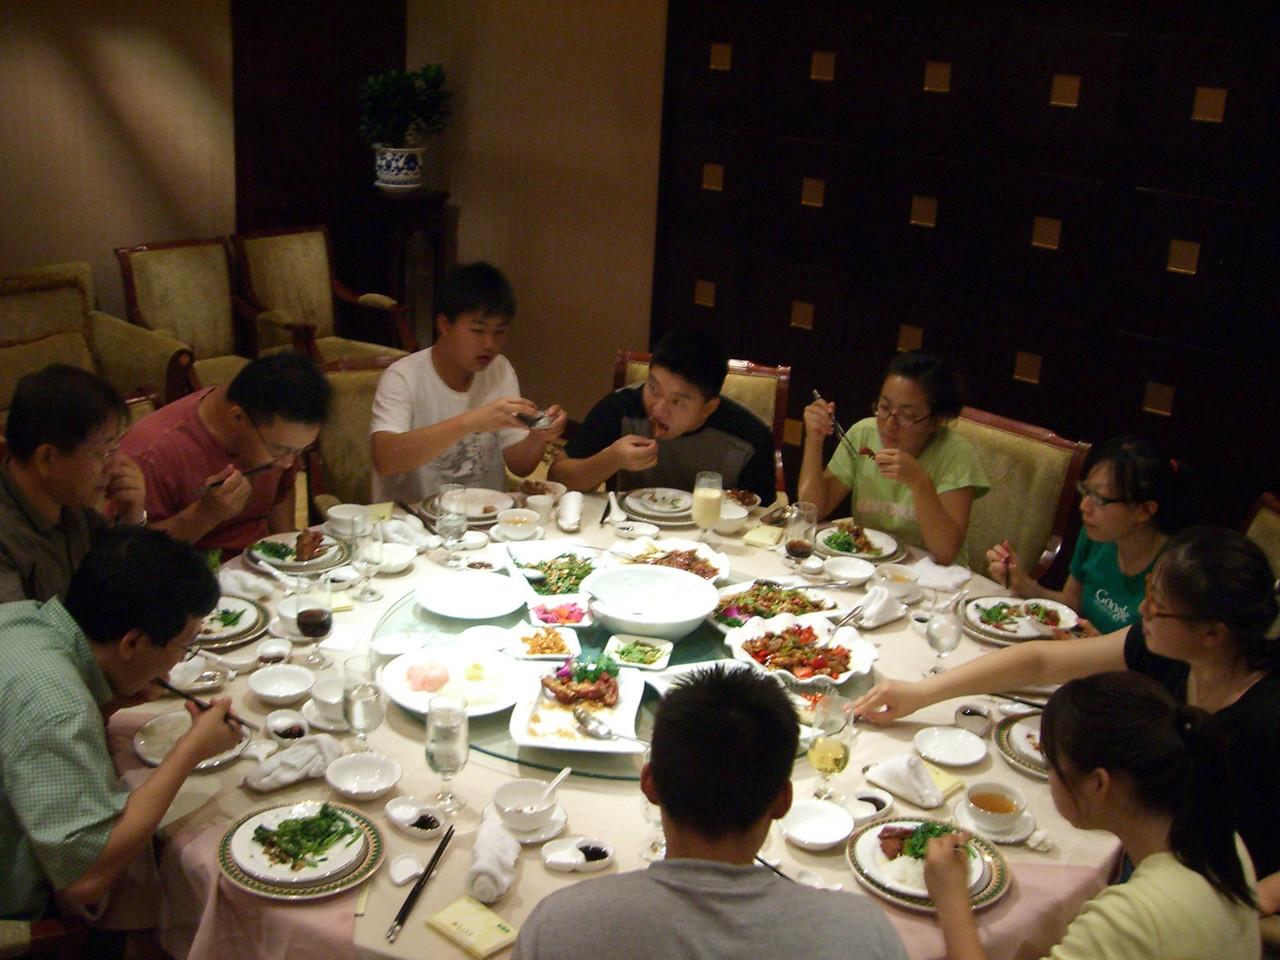 2006 07 14 Fri - Private banquet room 1